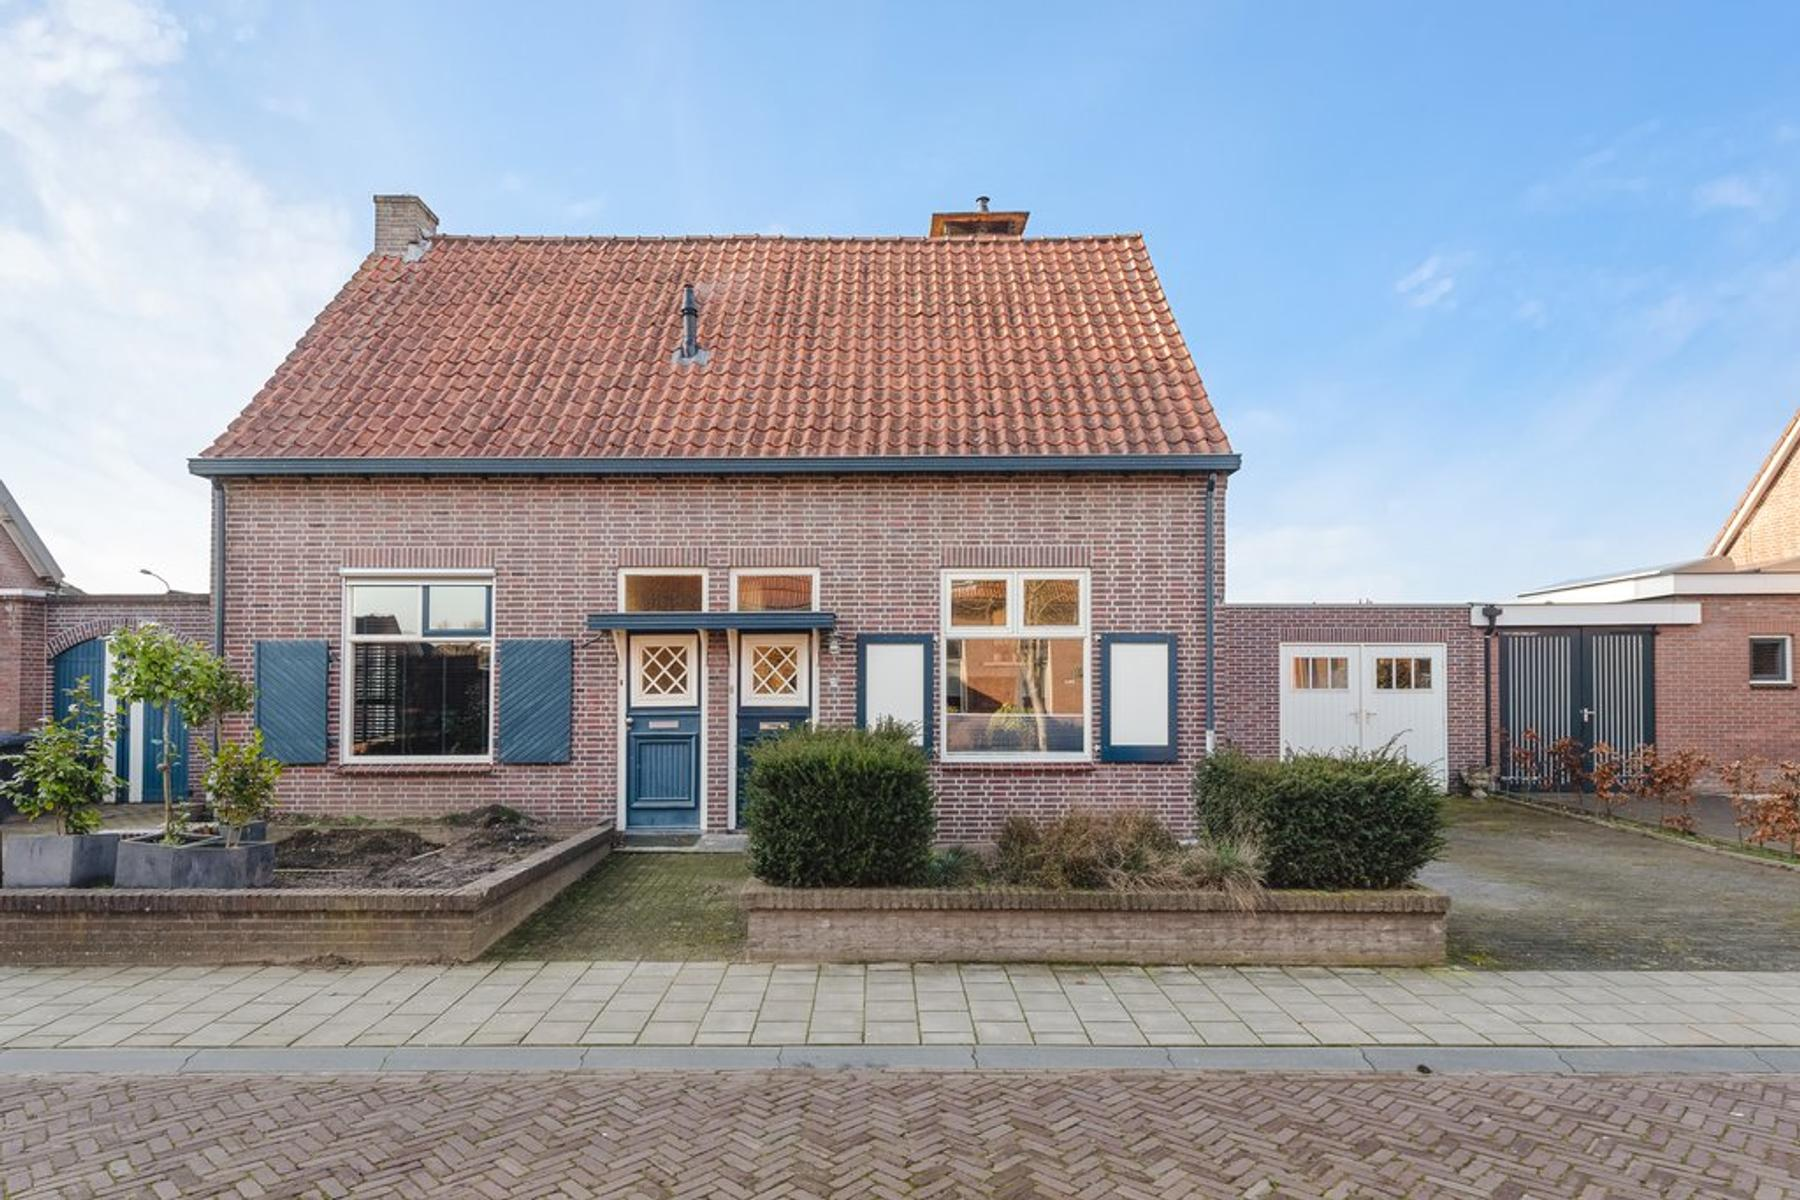 Nieuwstraat 20 in Raalte 8102 EJ